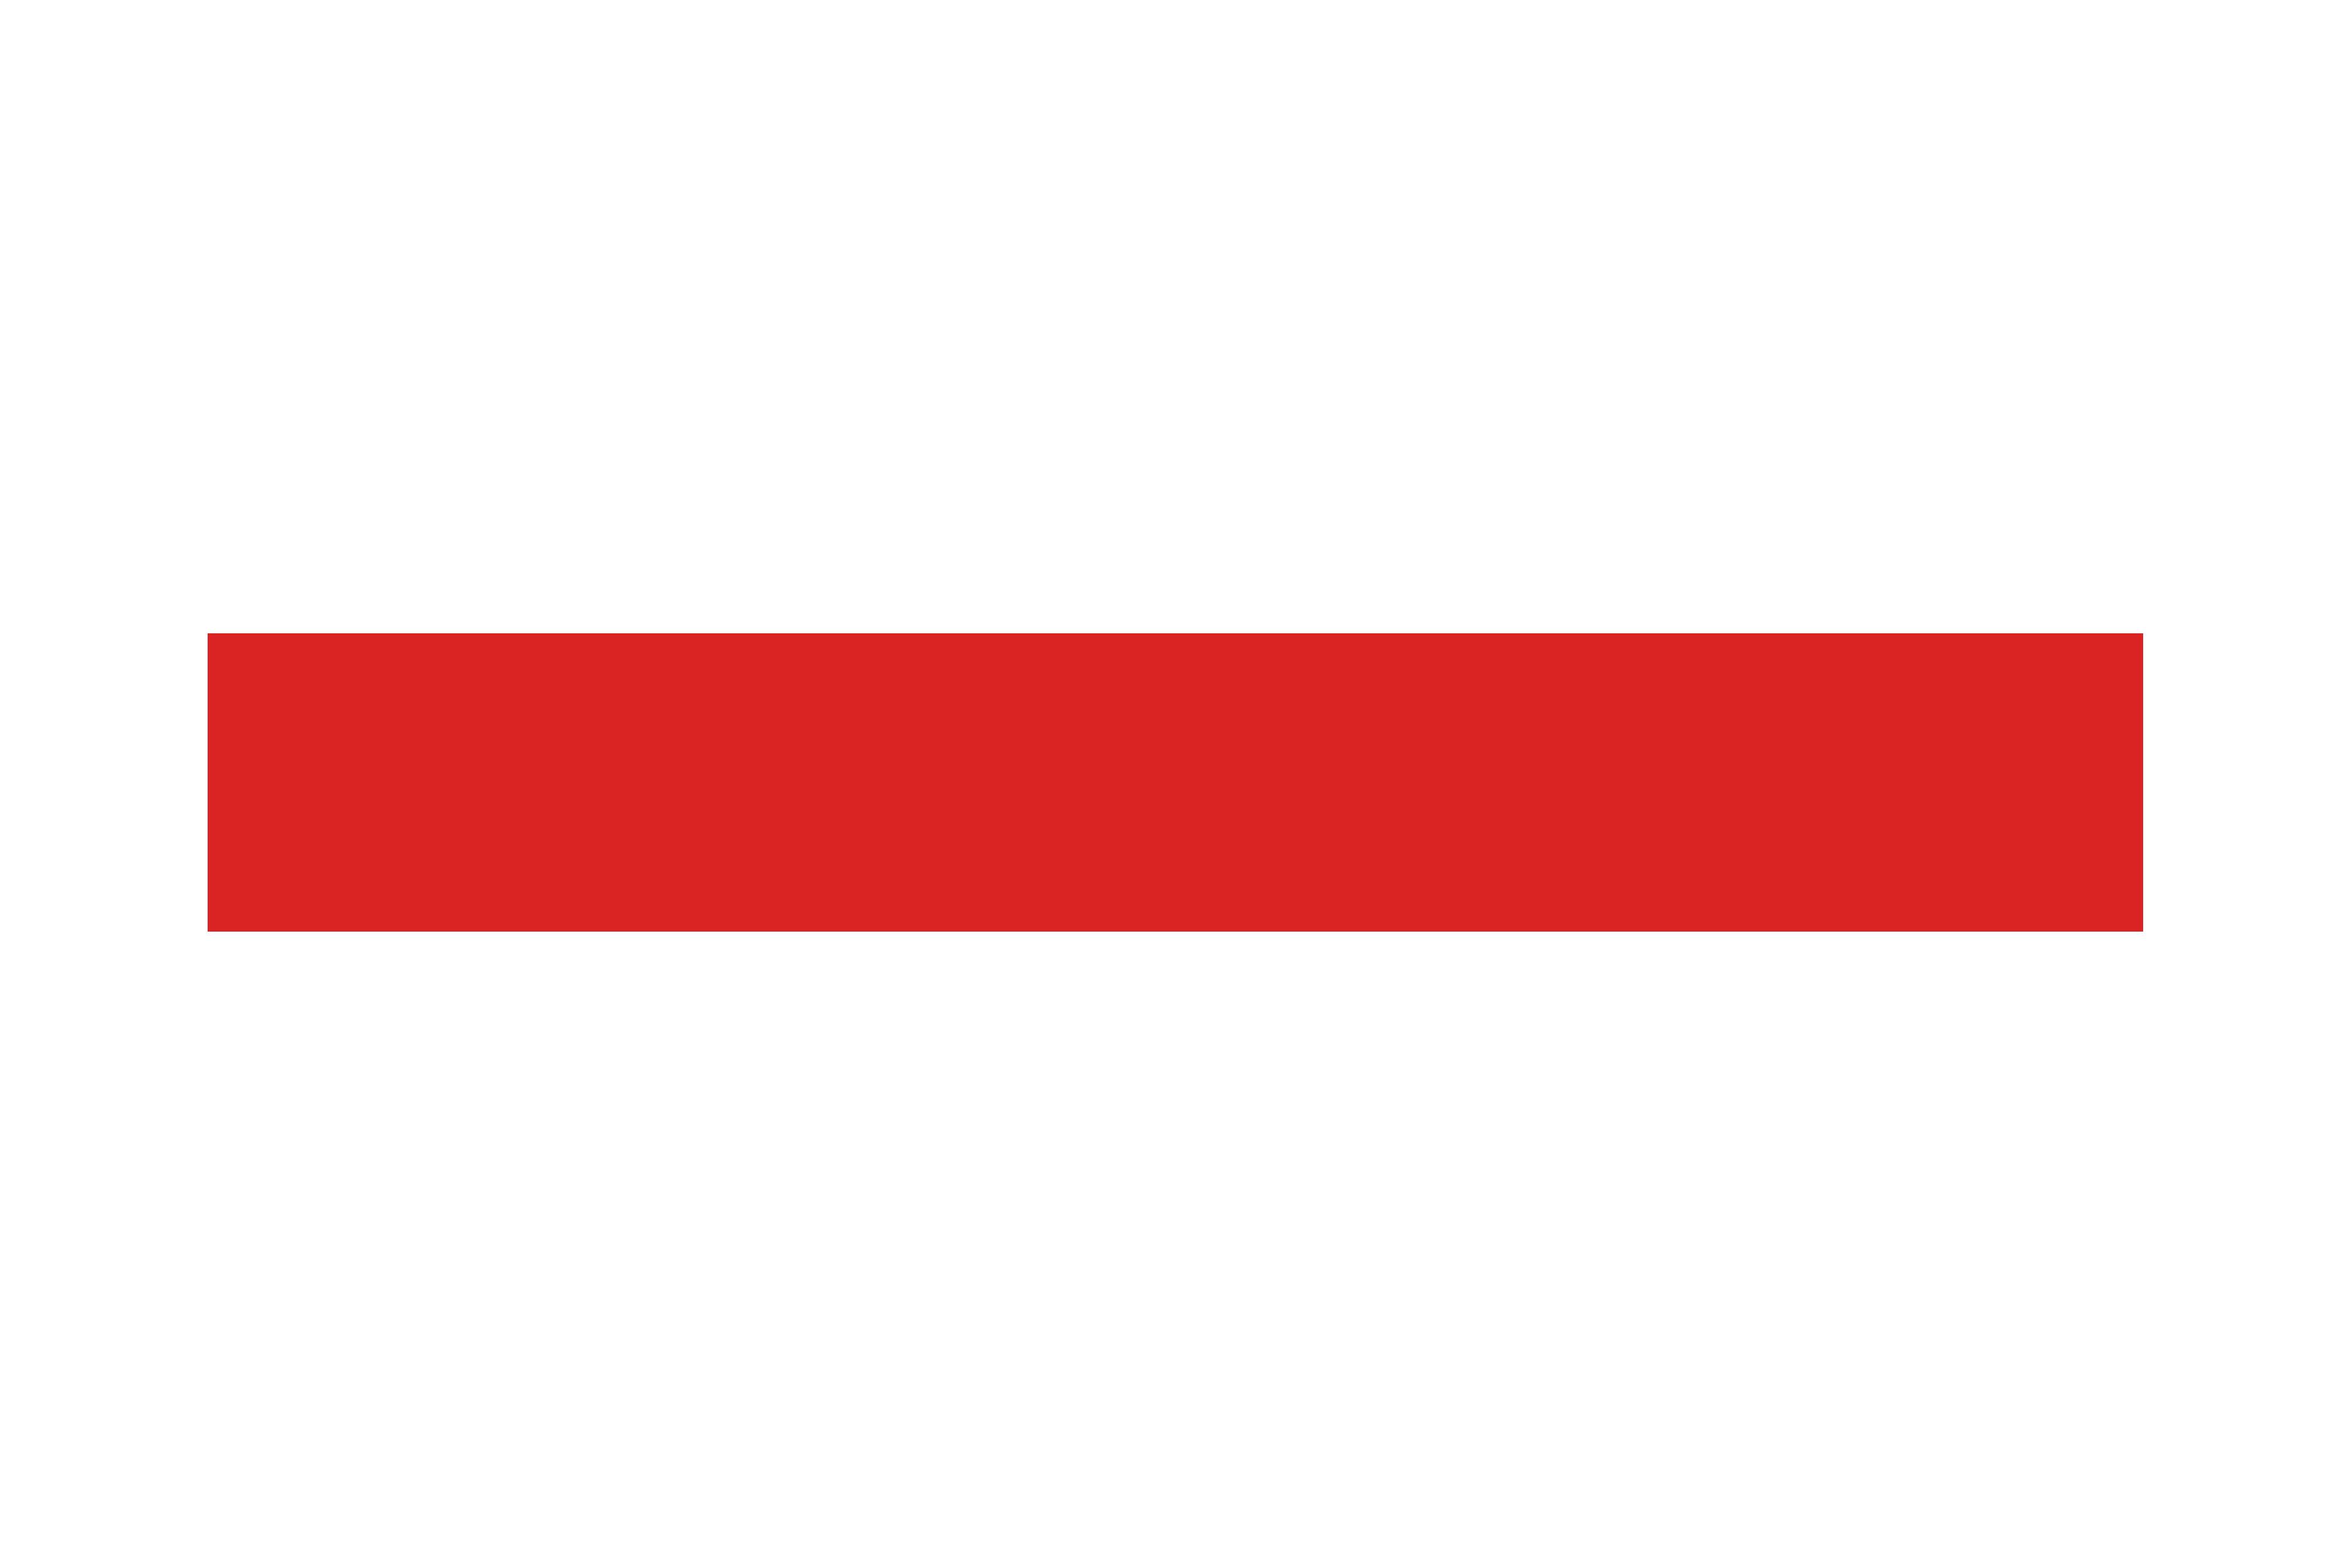 Die Mobiliar Logo